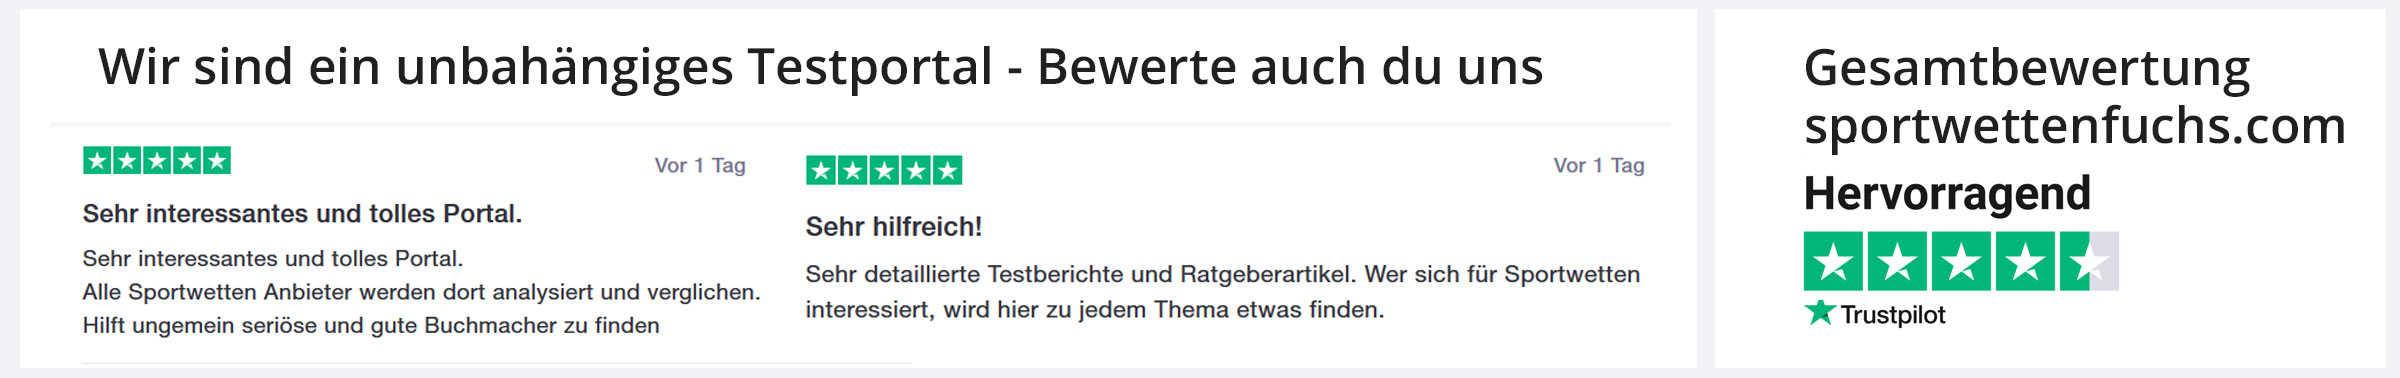 sportwettenfuchs.com trustpilot